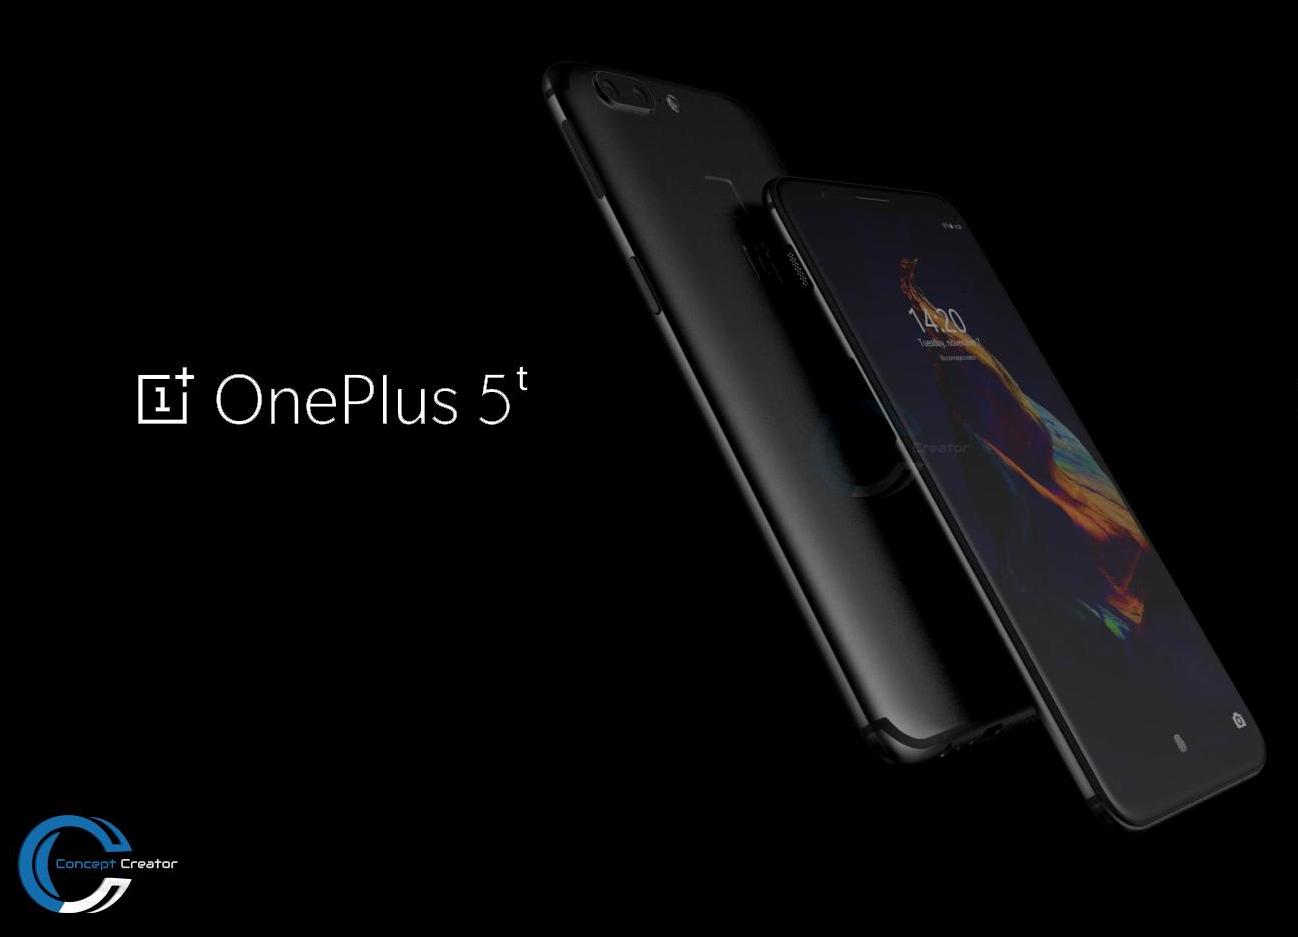 oneplus-5t-concept-11